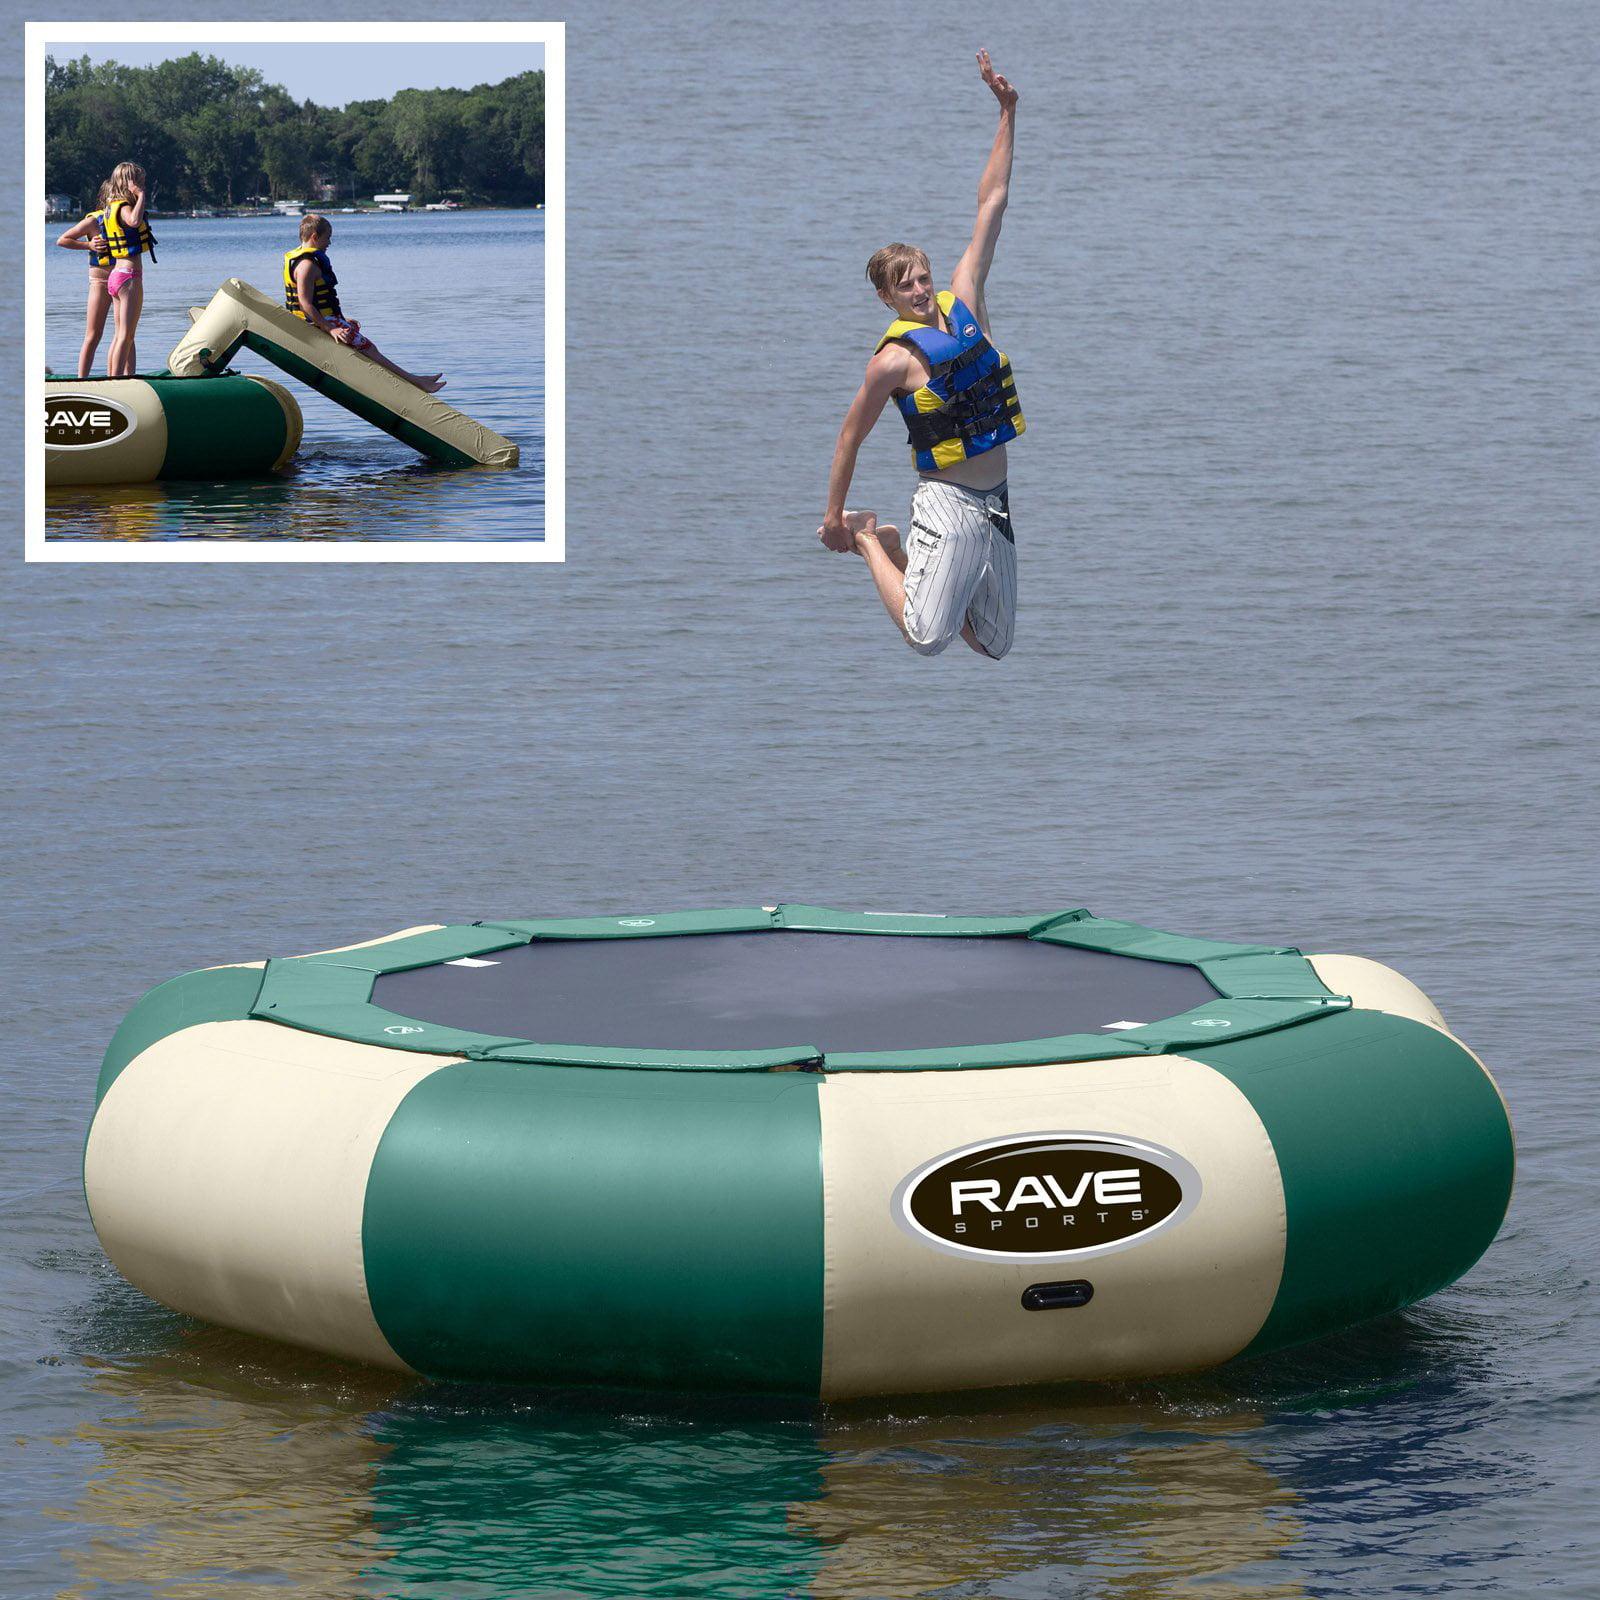 15 ft. RAVE Sports Northwoods Aqua Jump Eclipse Water Trampoline Package - Aqua Jump Trampoline + Slide